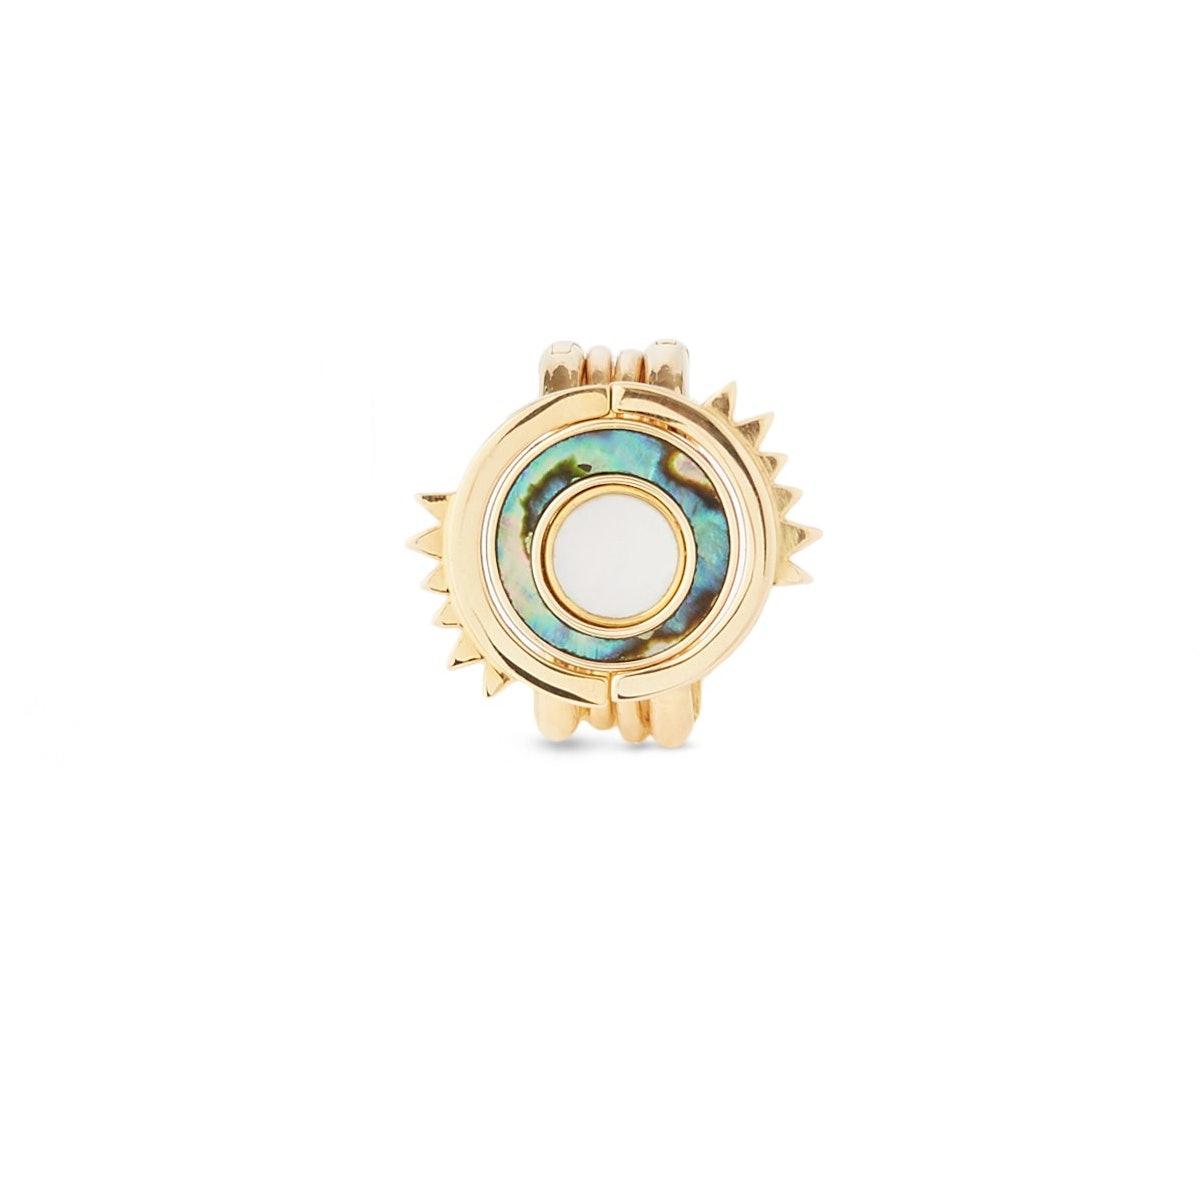 Solana 4-In-1 Rings/Earrings